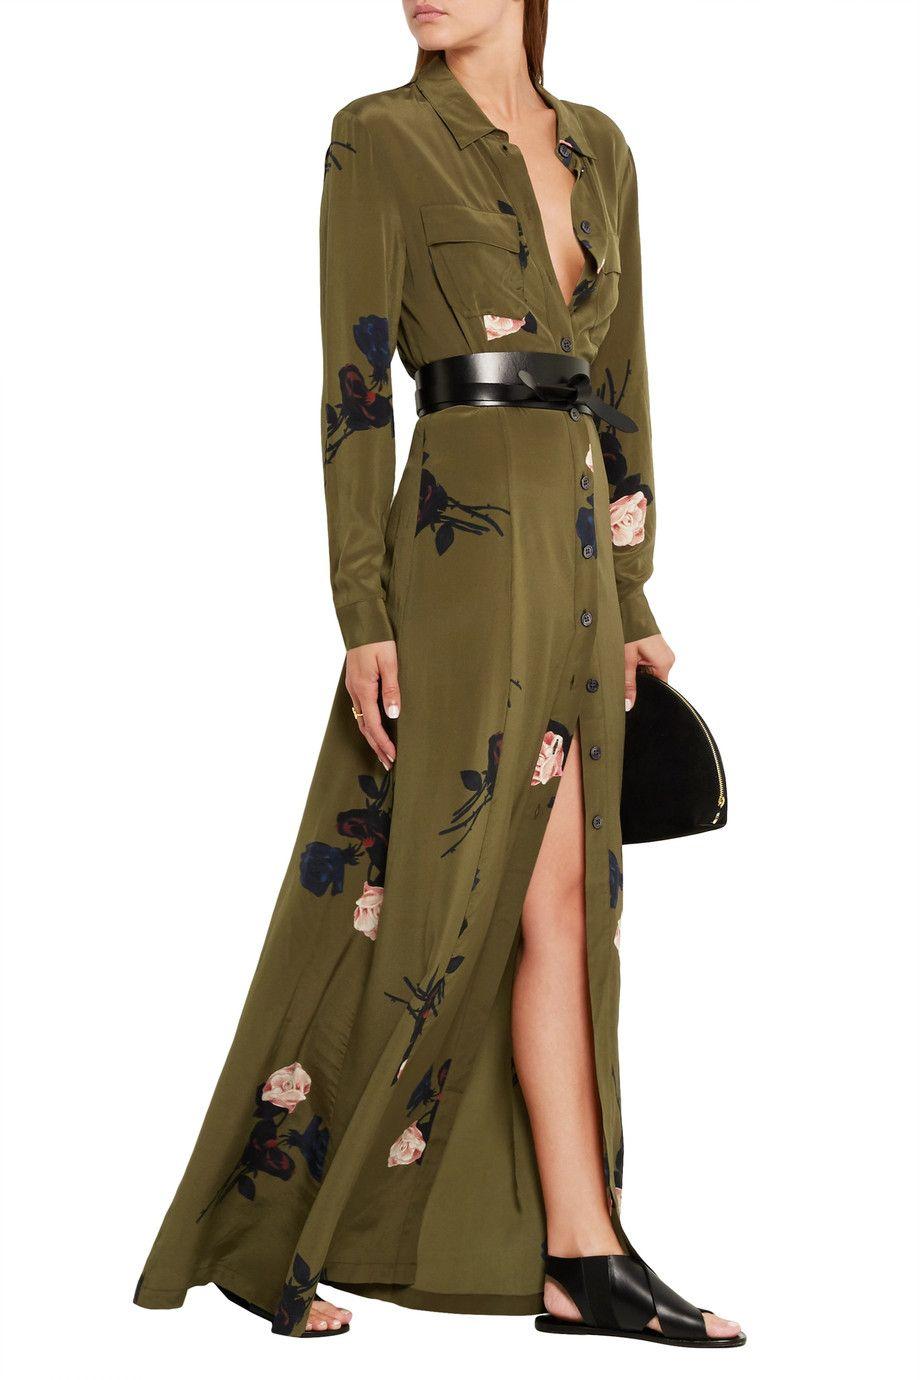 c0c50485 Shop on-sale GANNI Floral-print silk crepe de chine maxi dress. Browse  other discount designer Dresses & more on The Most Fashionable Fashion  Outlet, ...